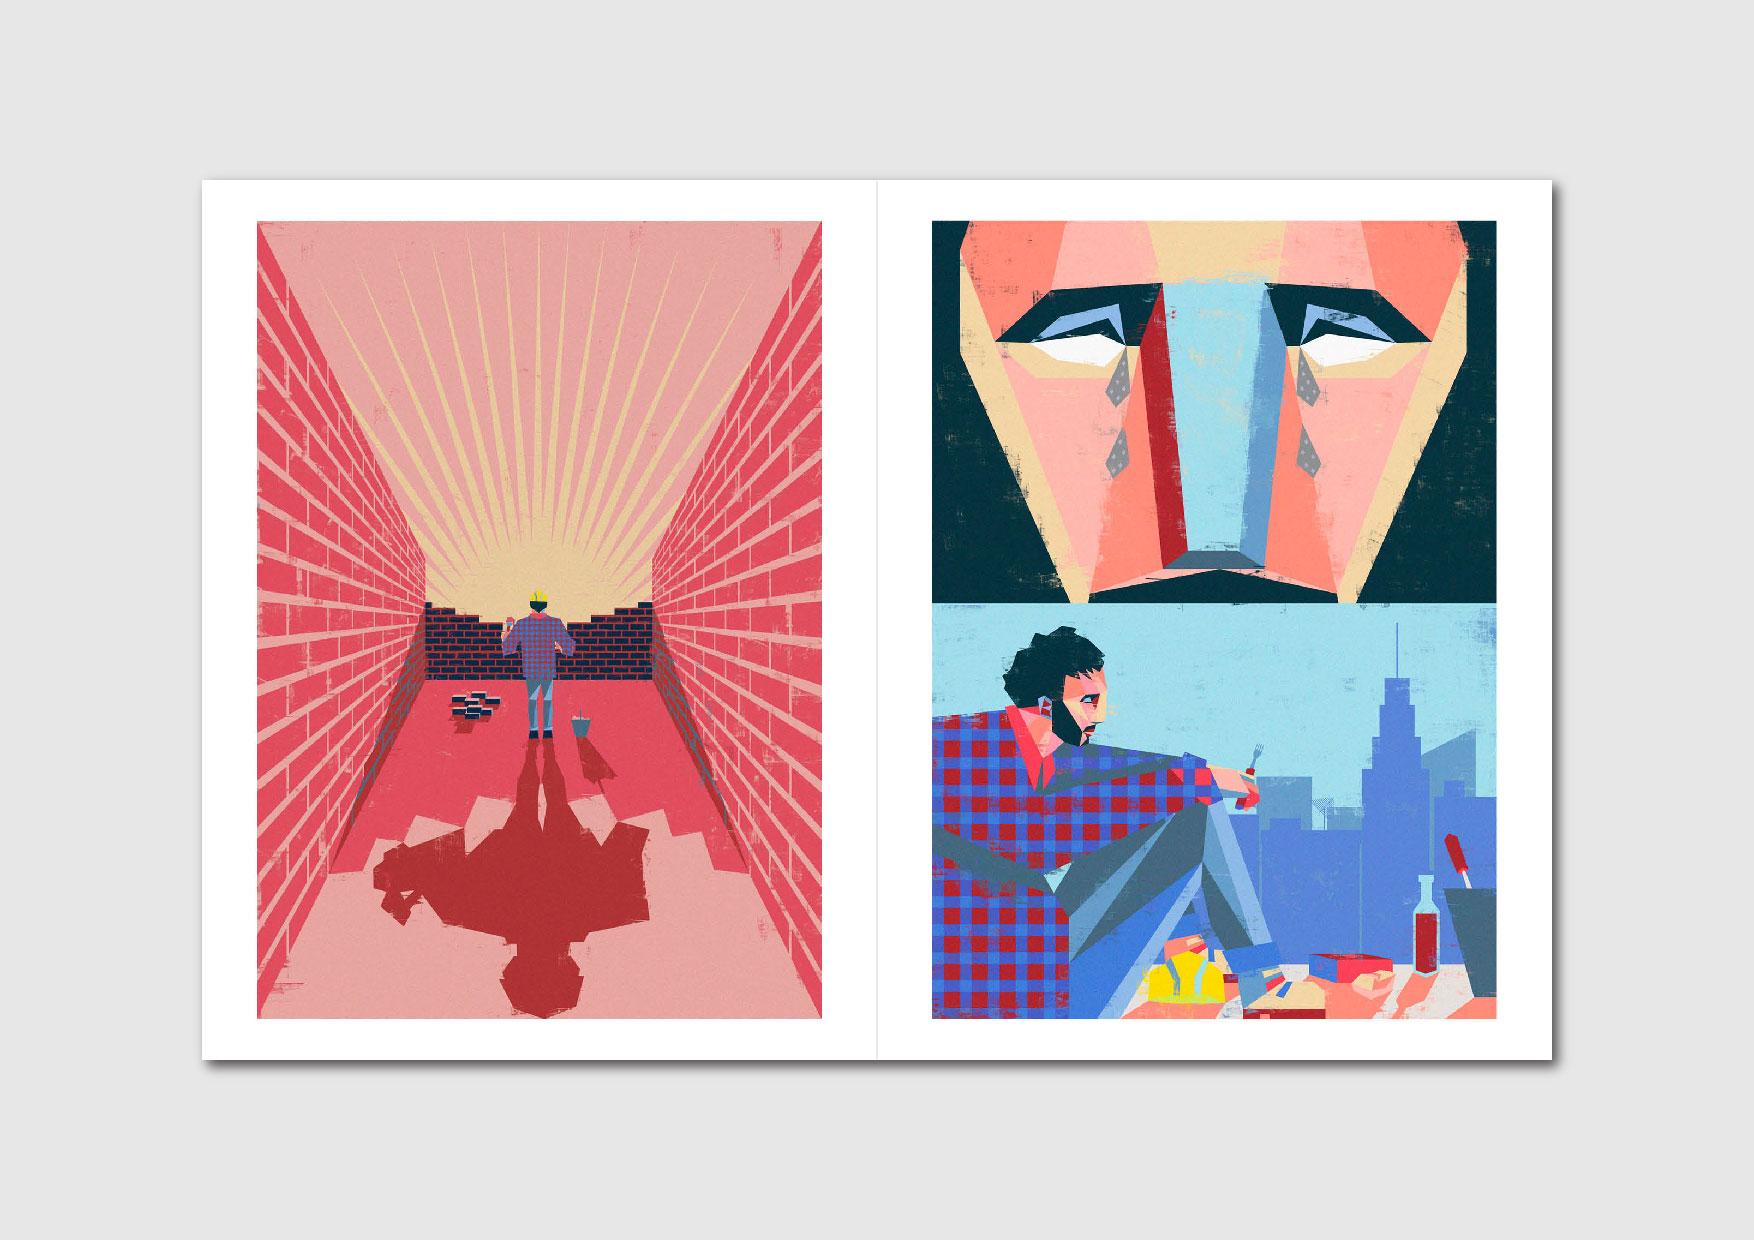 La Modernidad: illustration series by Uruguayan artist Leandro Bustamante